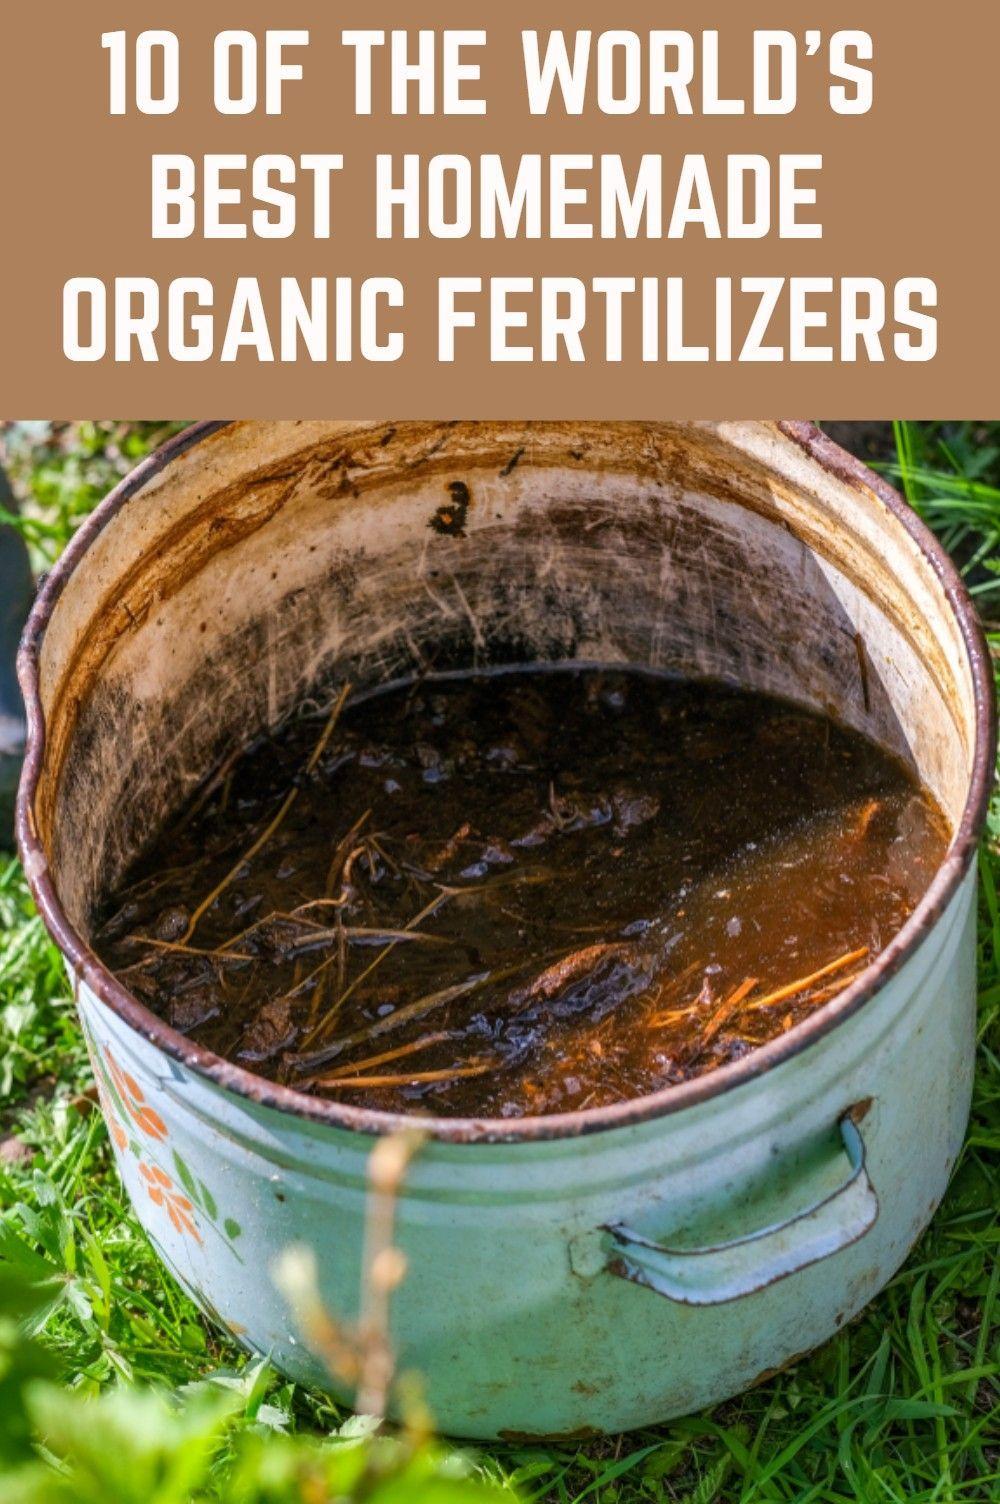 10 Of The World S Best Homemade Organic Fertilizers Homemade Plant Fertilizer Fertilizer For Plants Organic Fertilizer